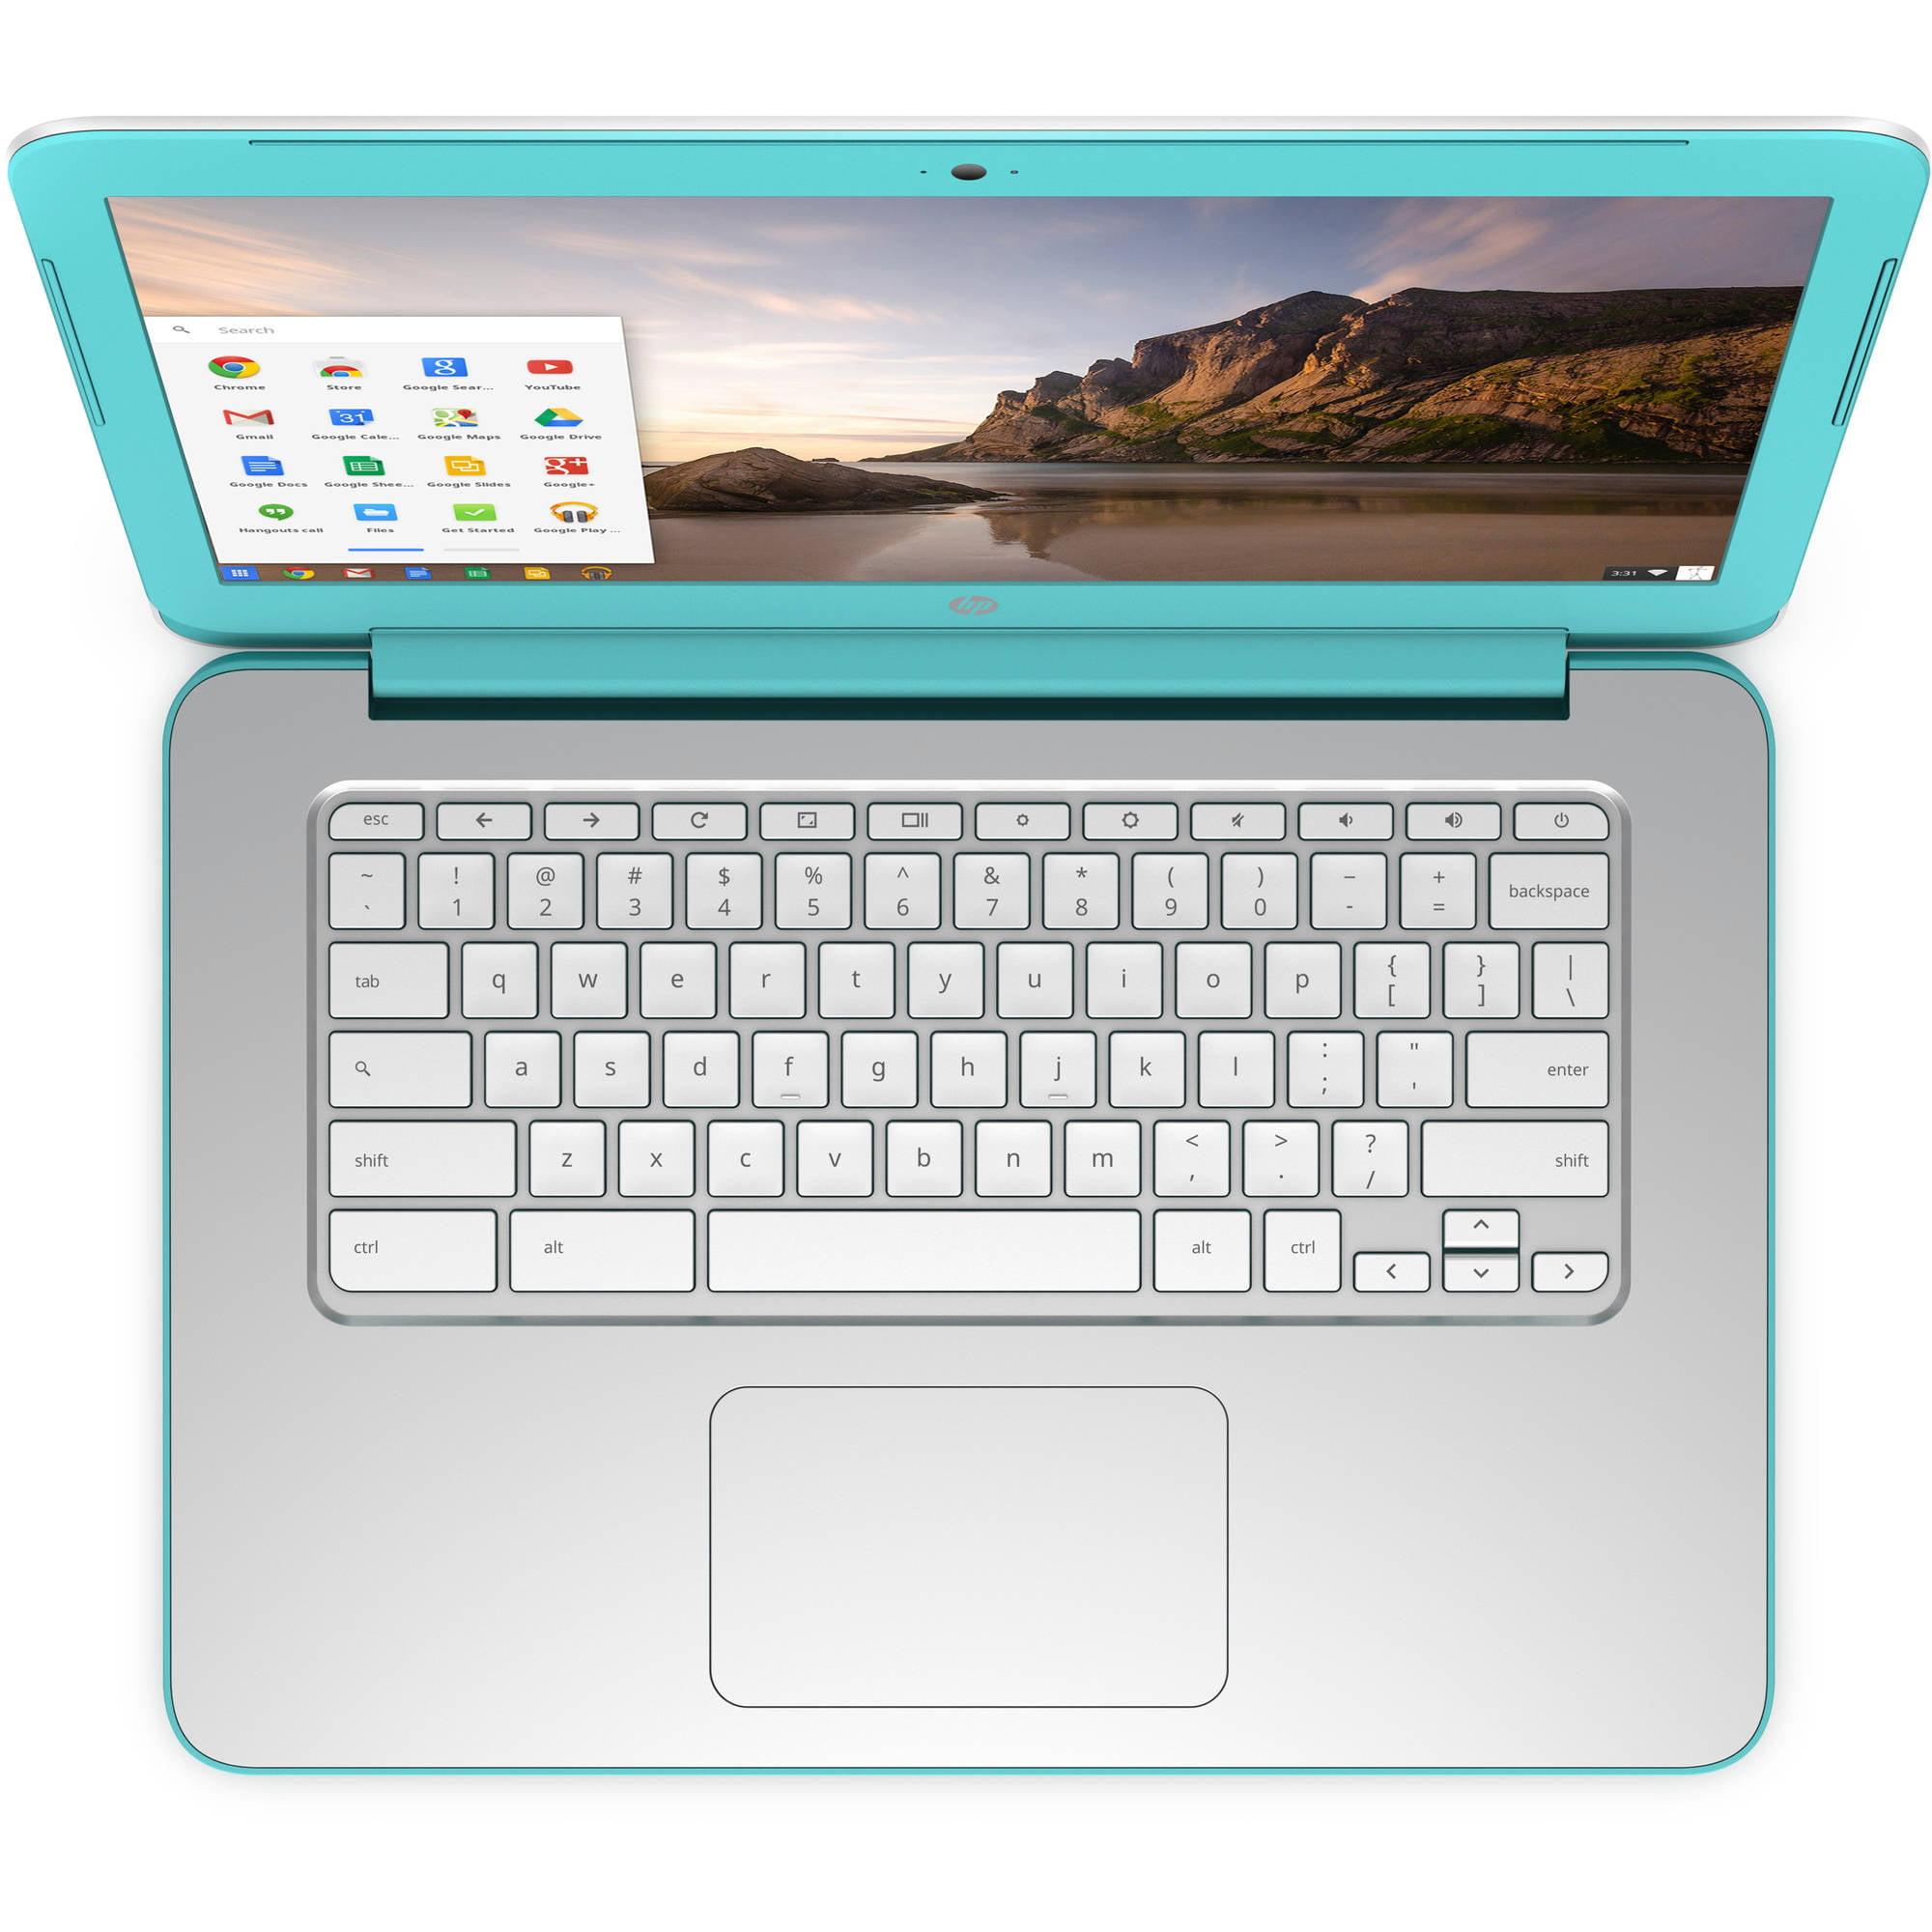 "Refurbished HP White/Turquoise 14"" 14-x010wm Chromebook PC with NVIDIA Tegra K1 Mobile Processor, 2GB Memory, 16GB eMMC and Chrome OS"